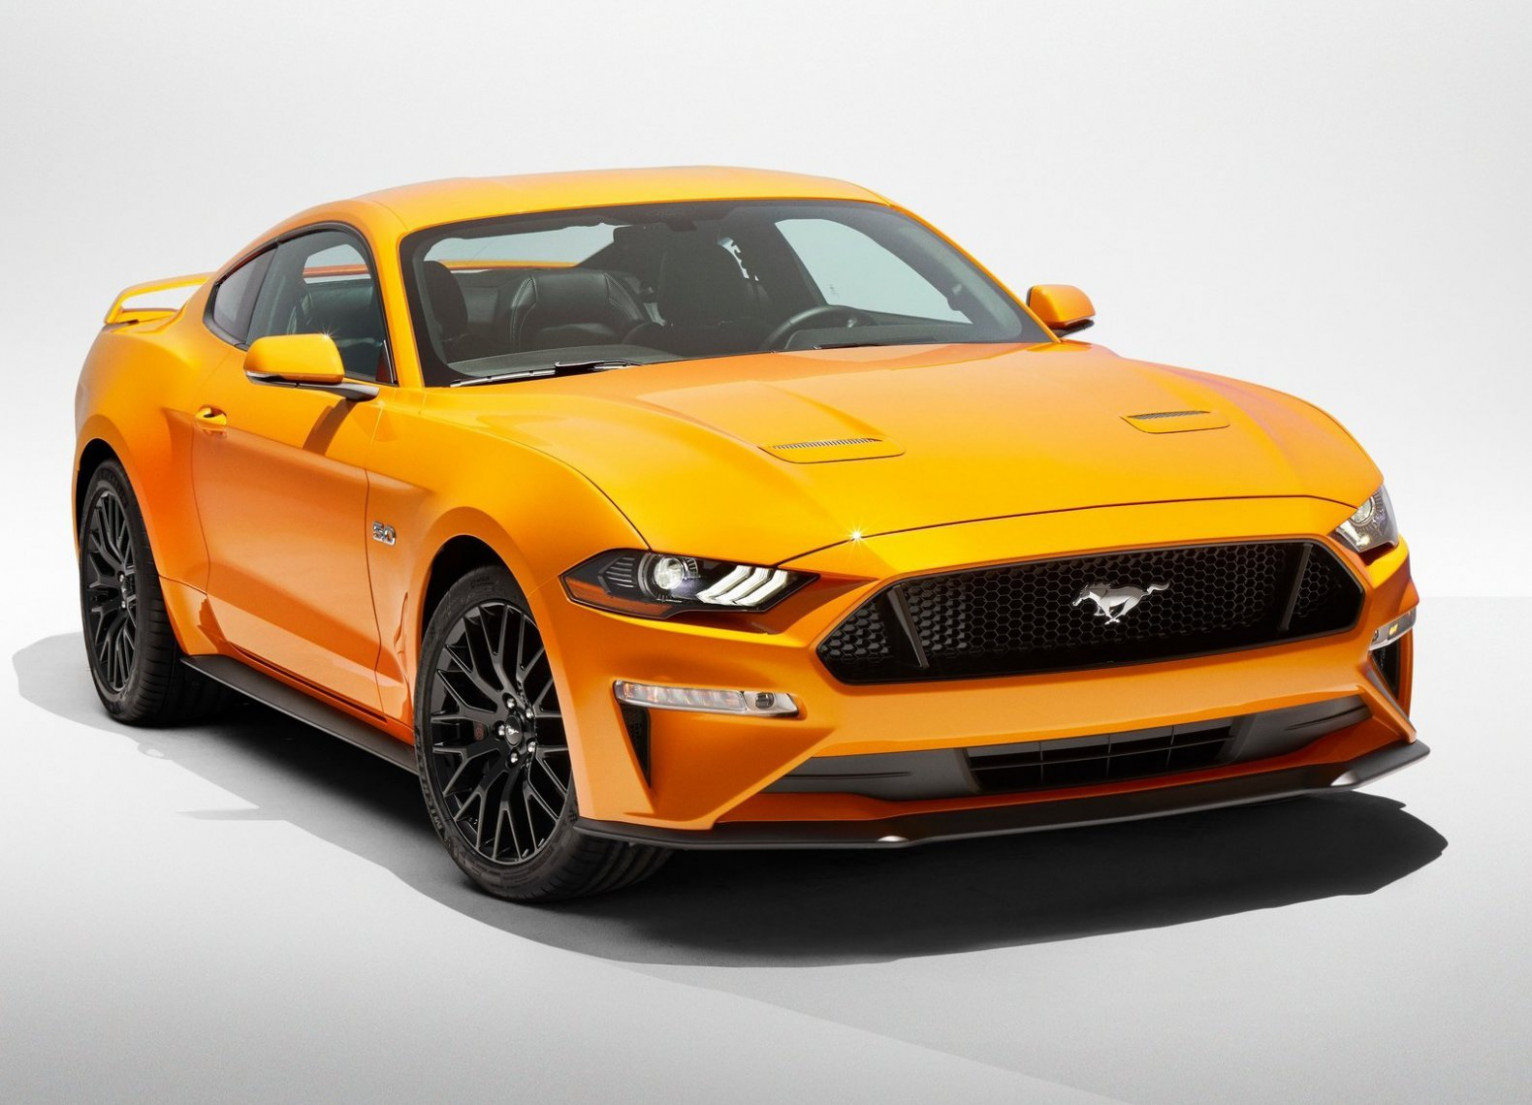 New Concept 2022 Mustang Rocket